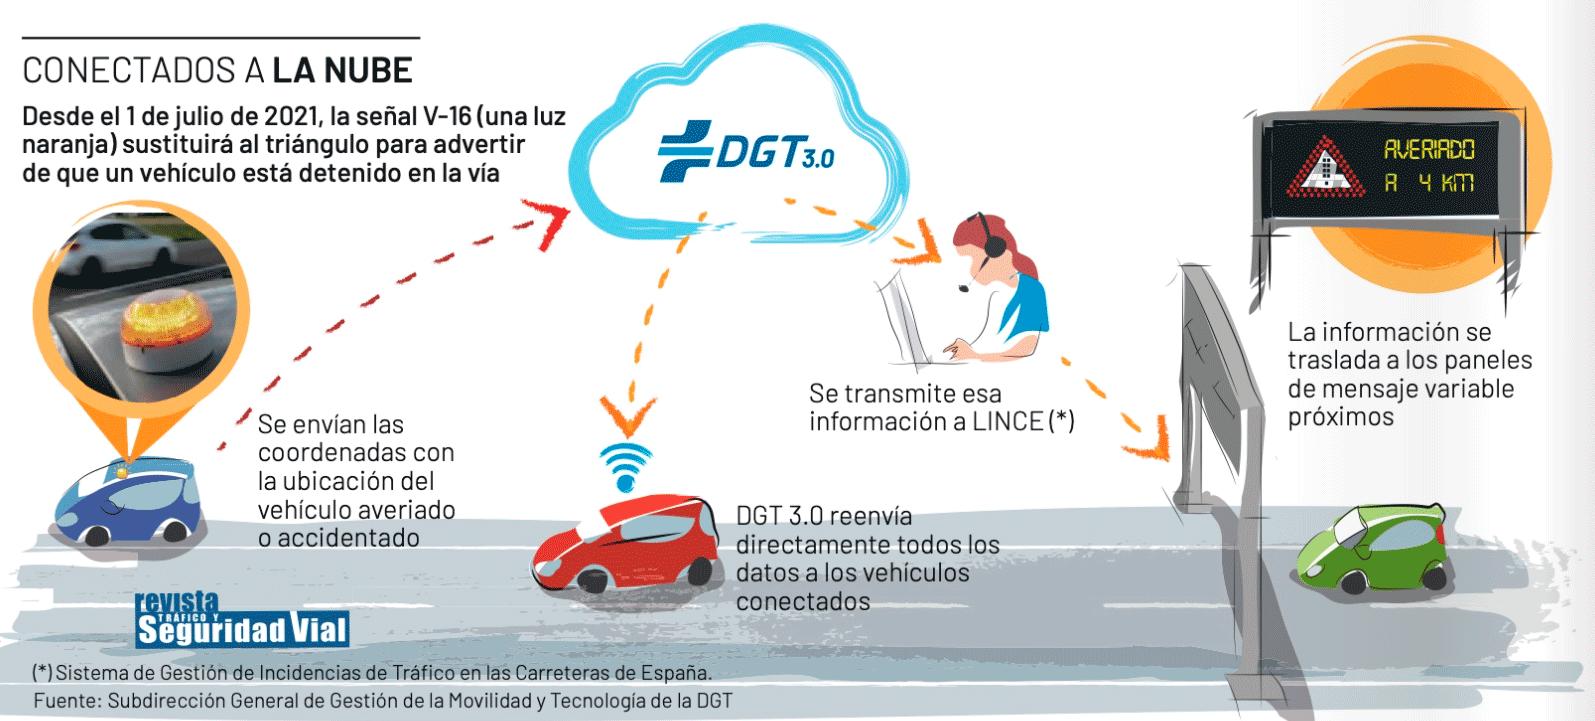 infografía DGT señal v16